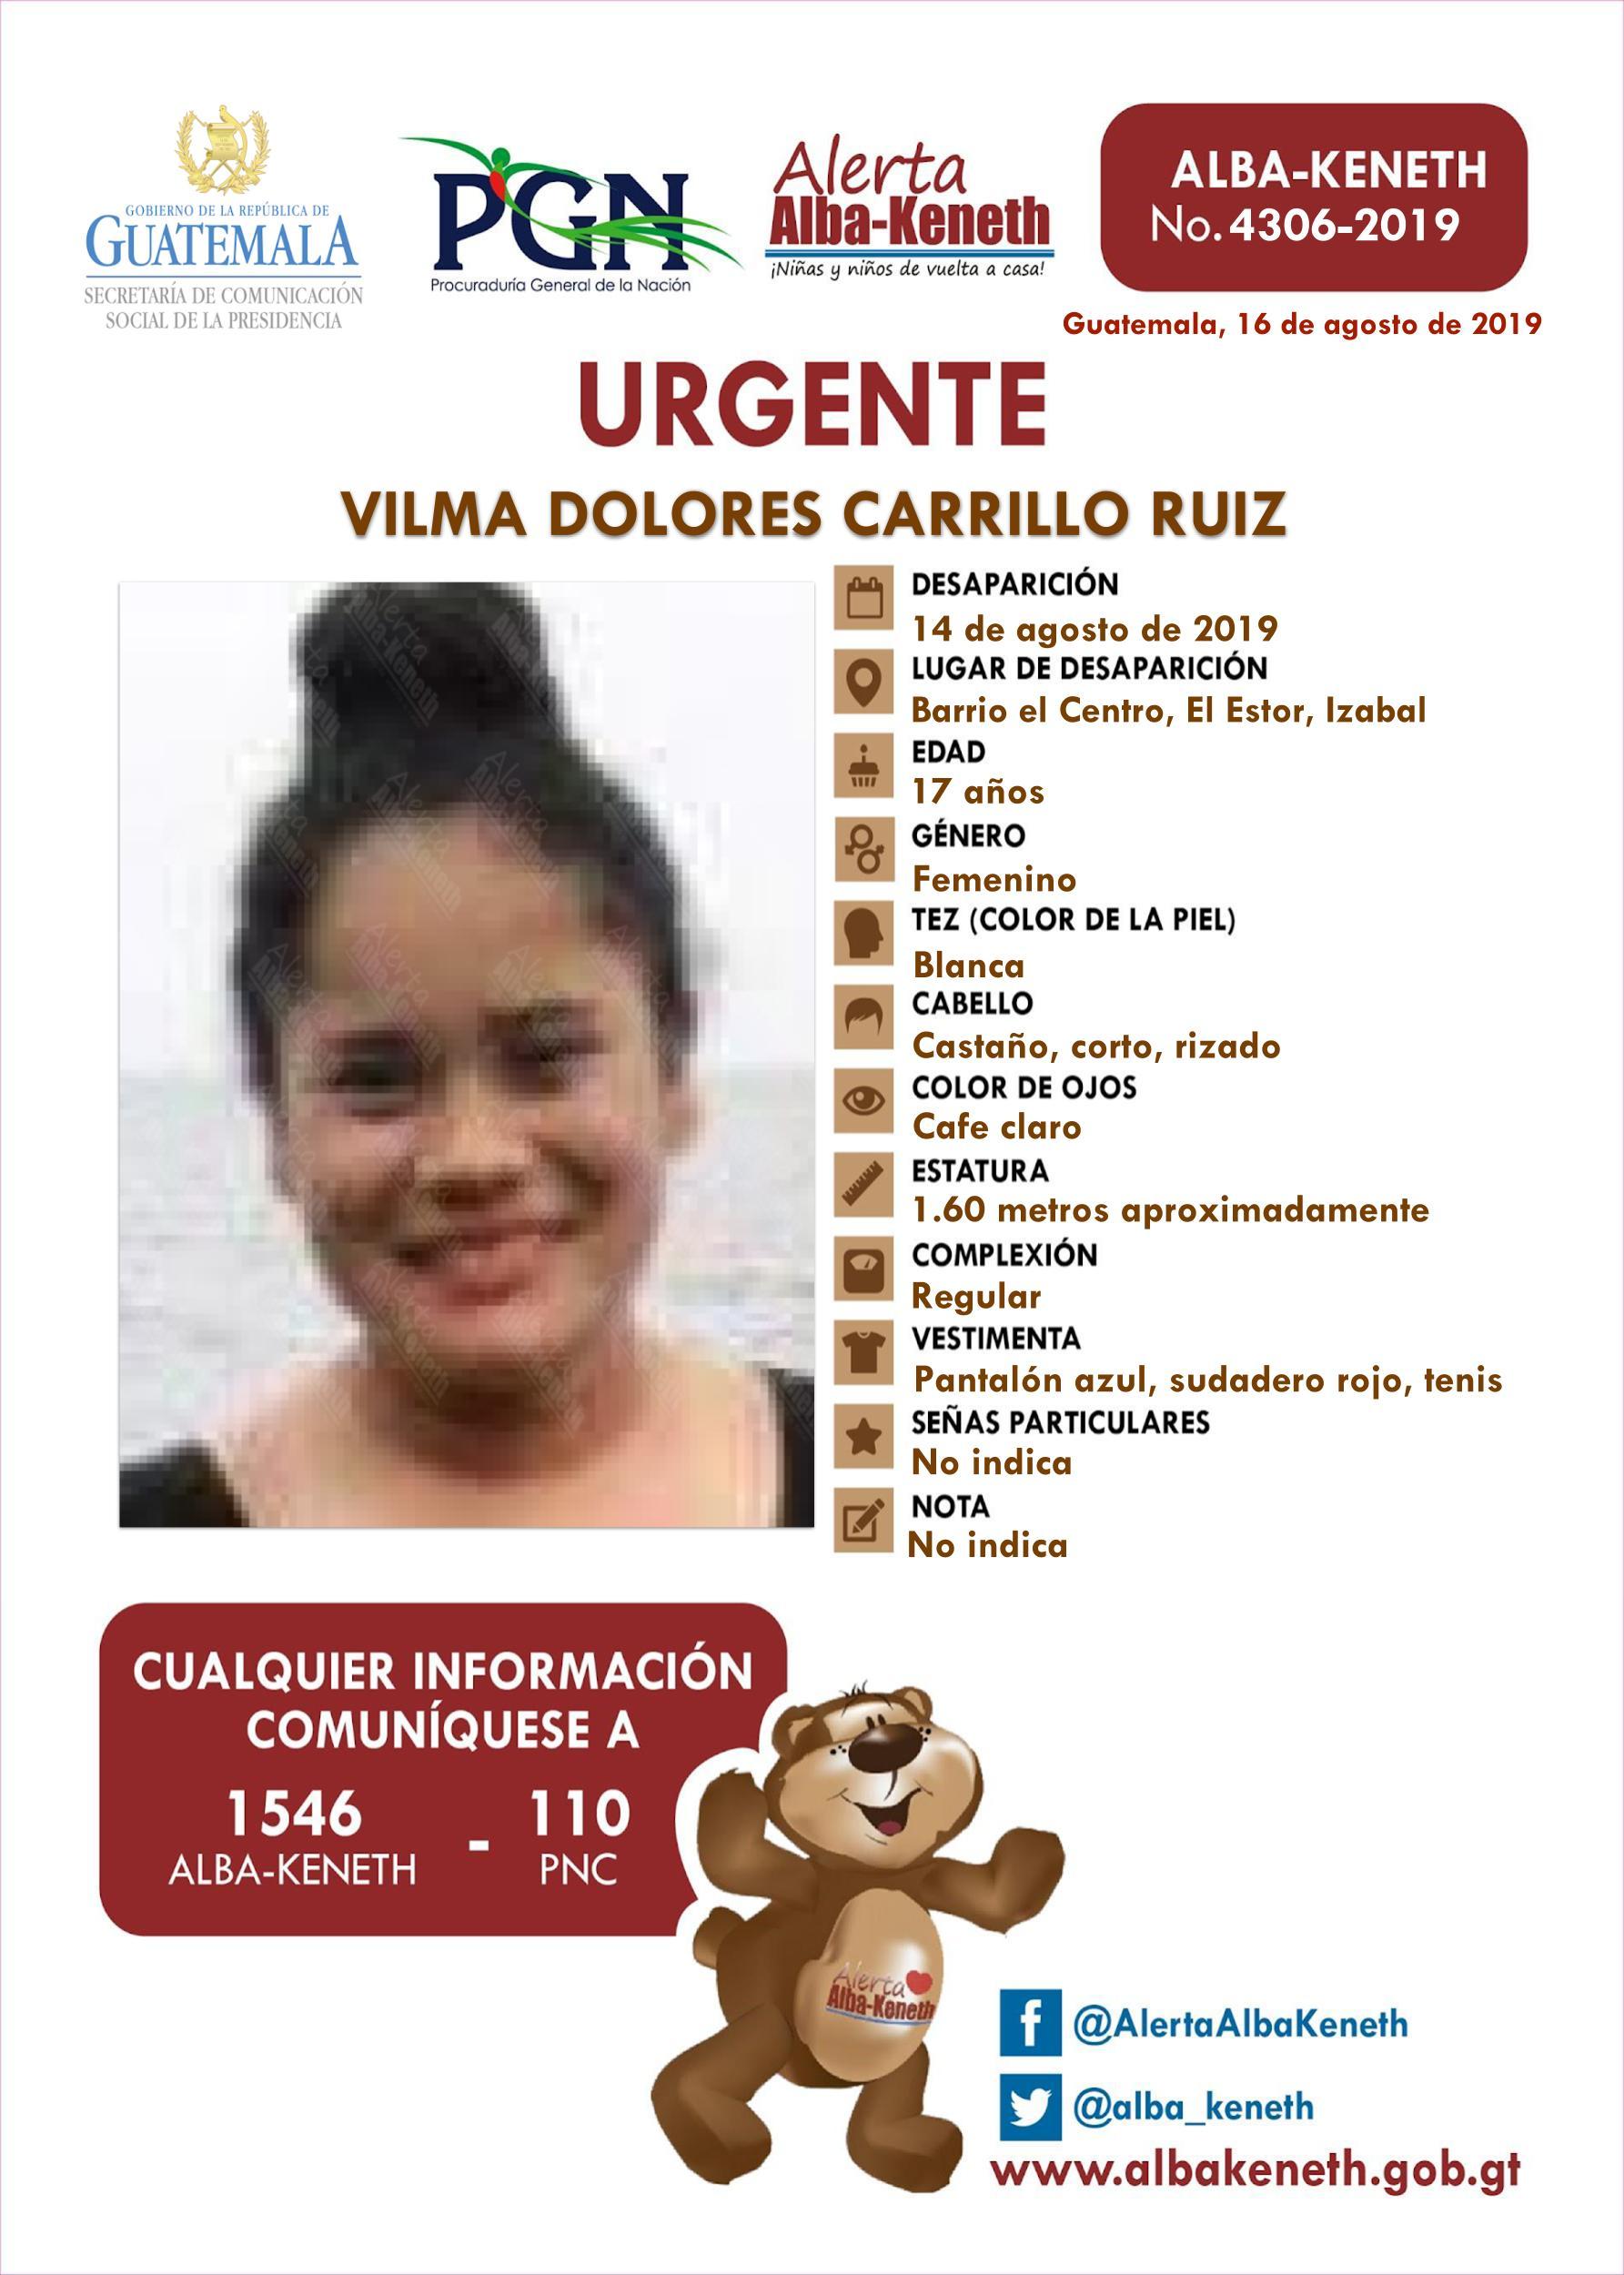 Vilma Dolores Carrillo Ruiz